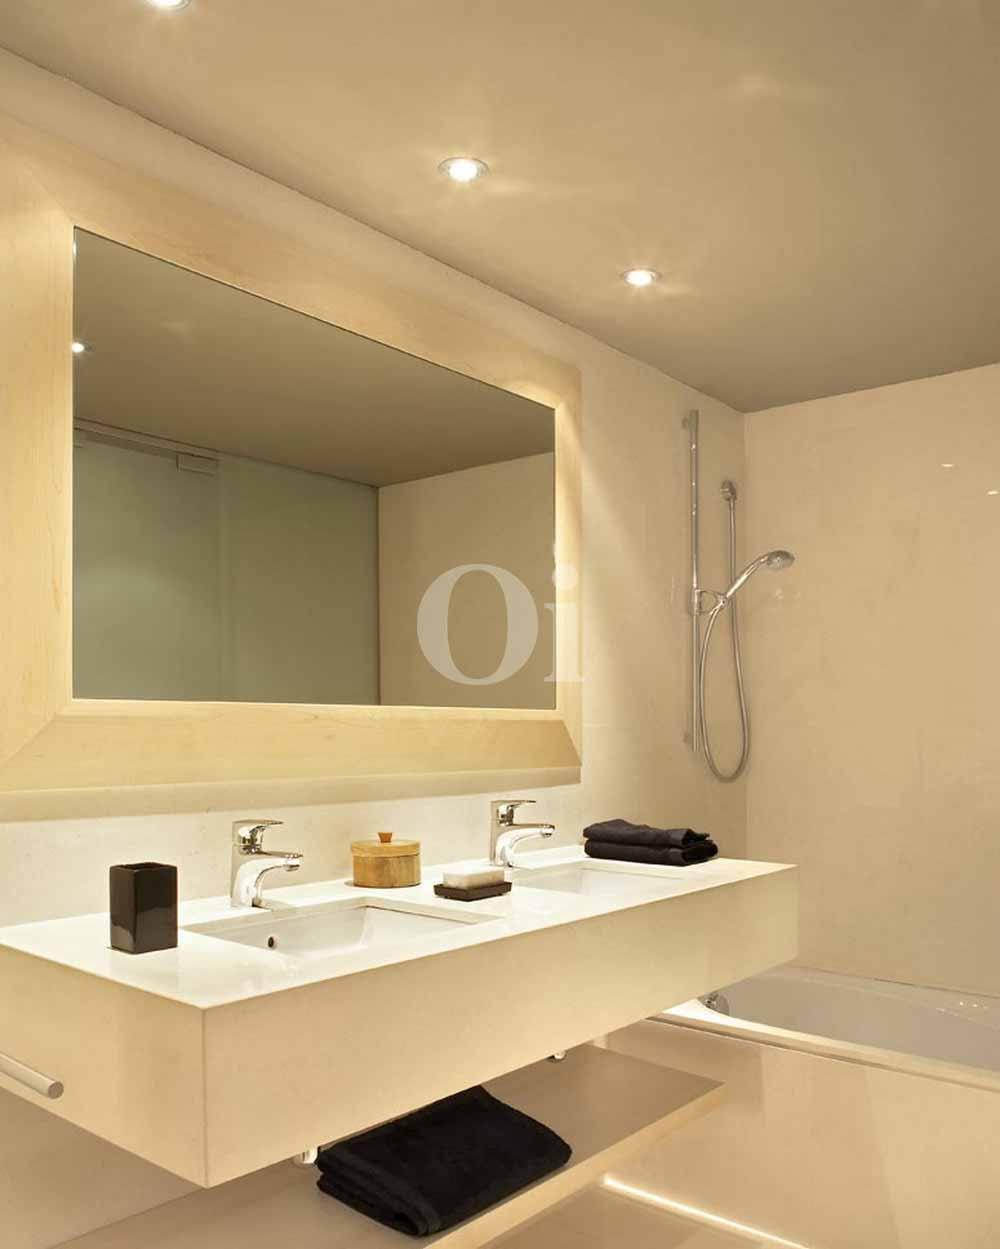 Baño con bañera de precioso apartamento en venta en Sant Gervasi - La Bonanova